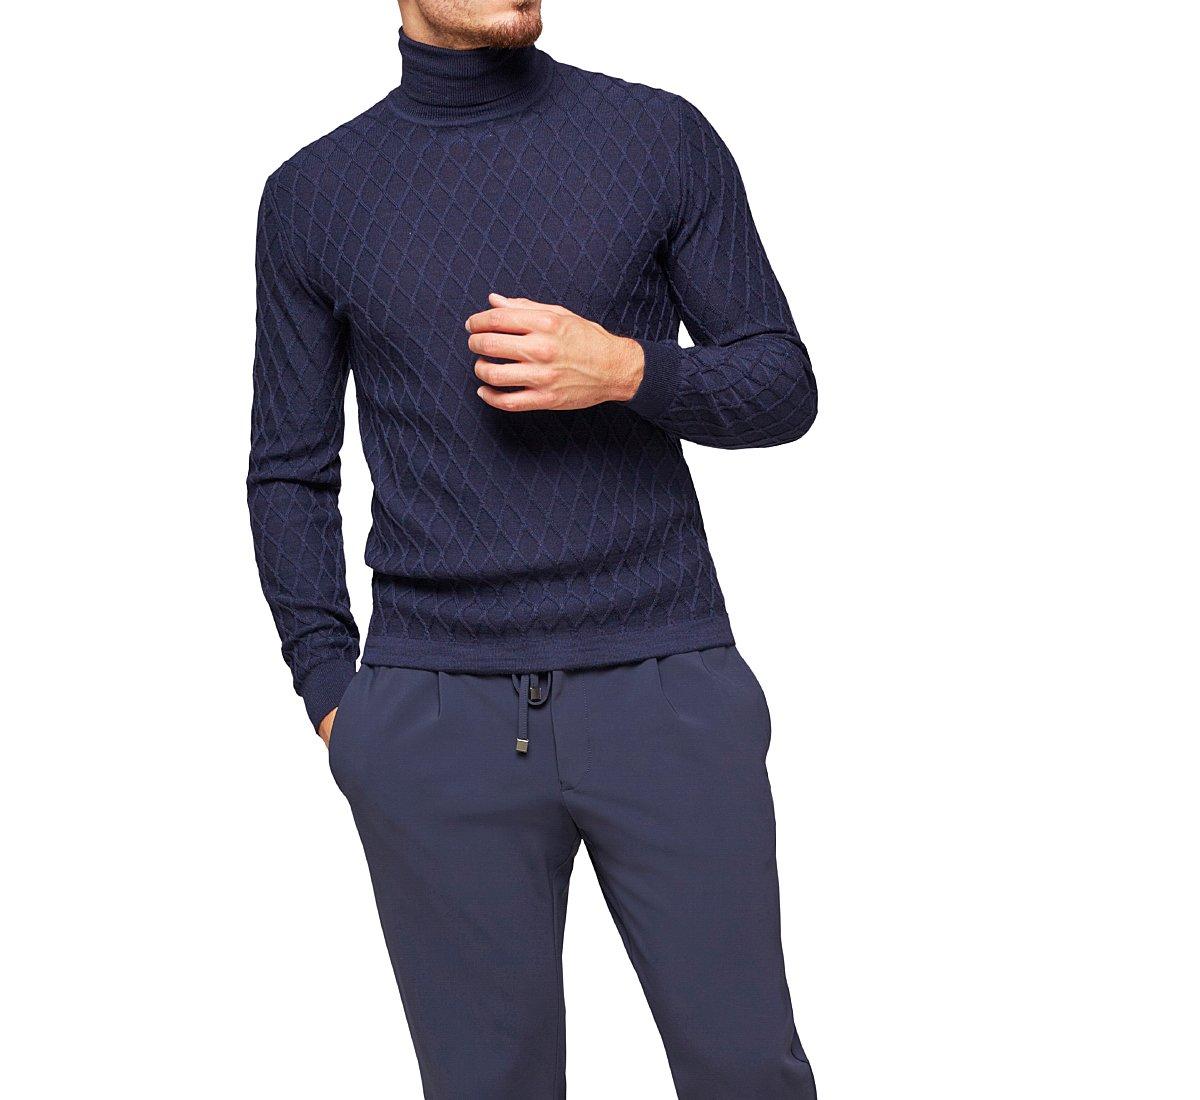 Straight-cut pullover